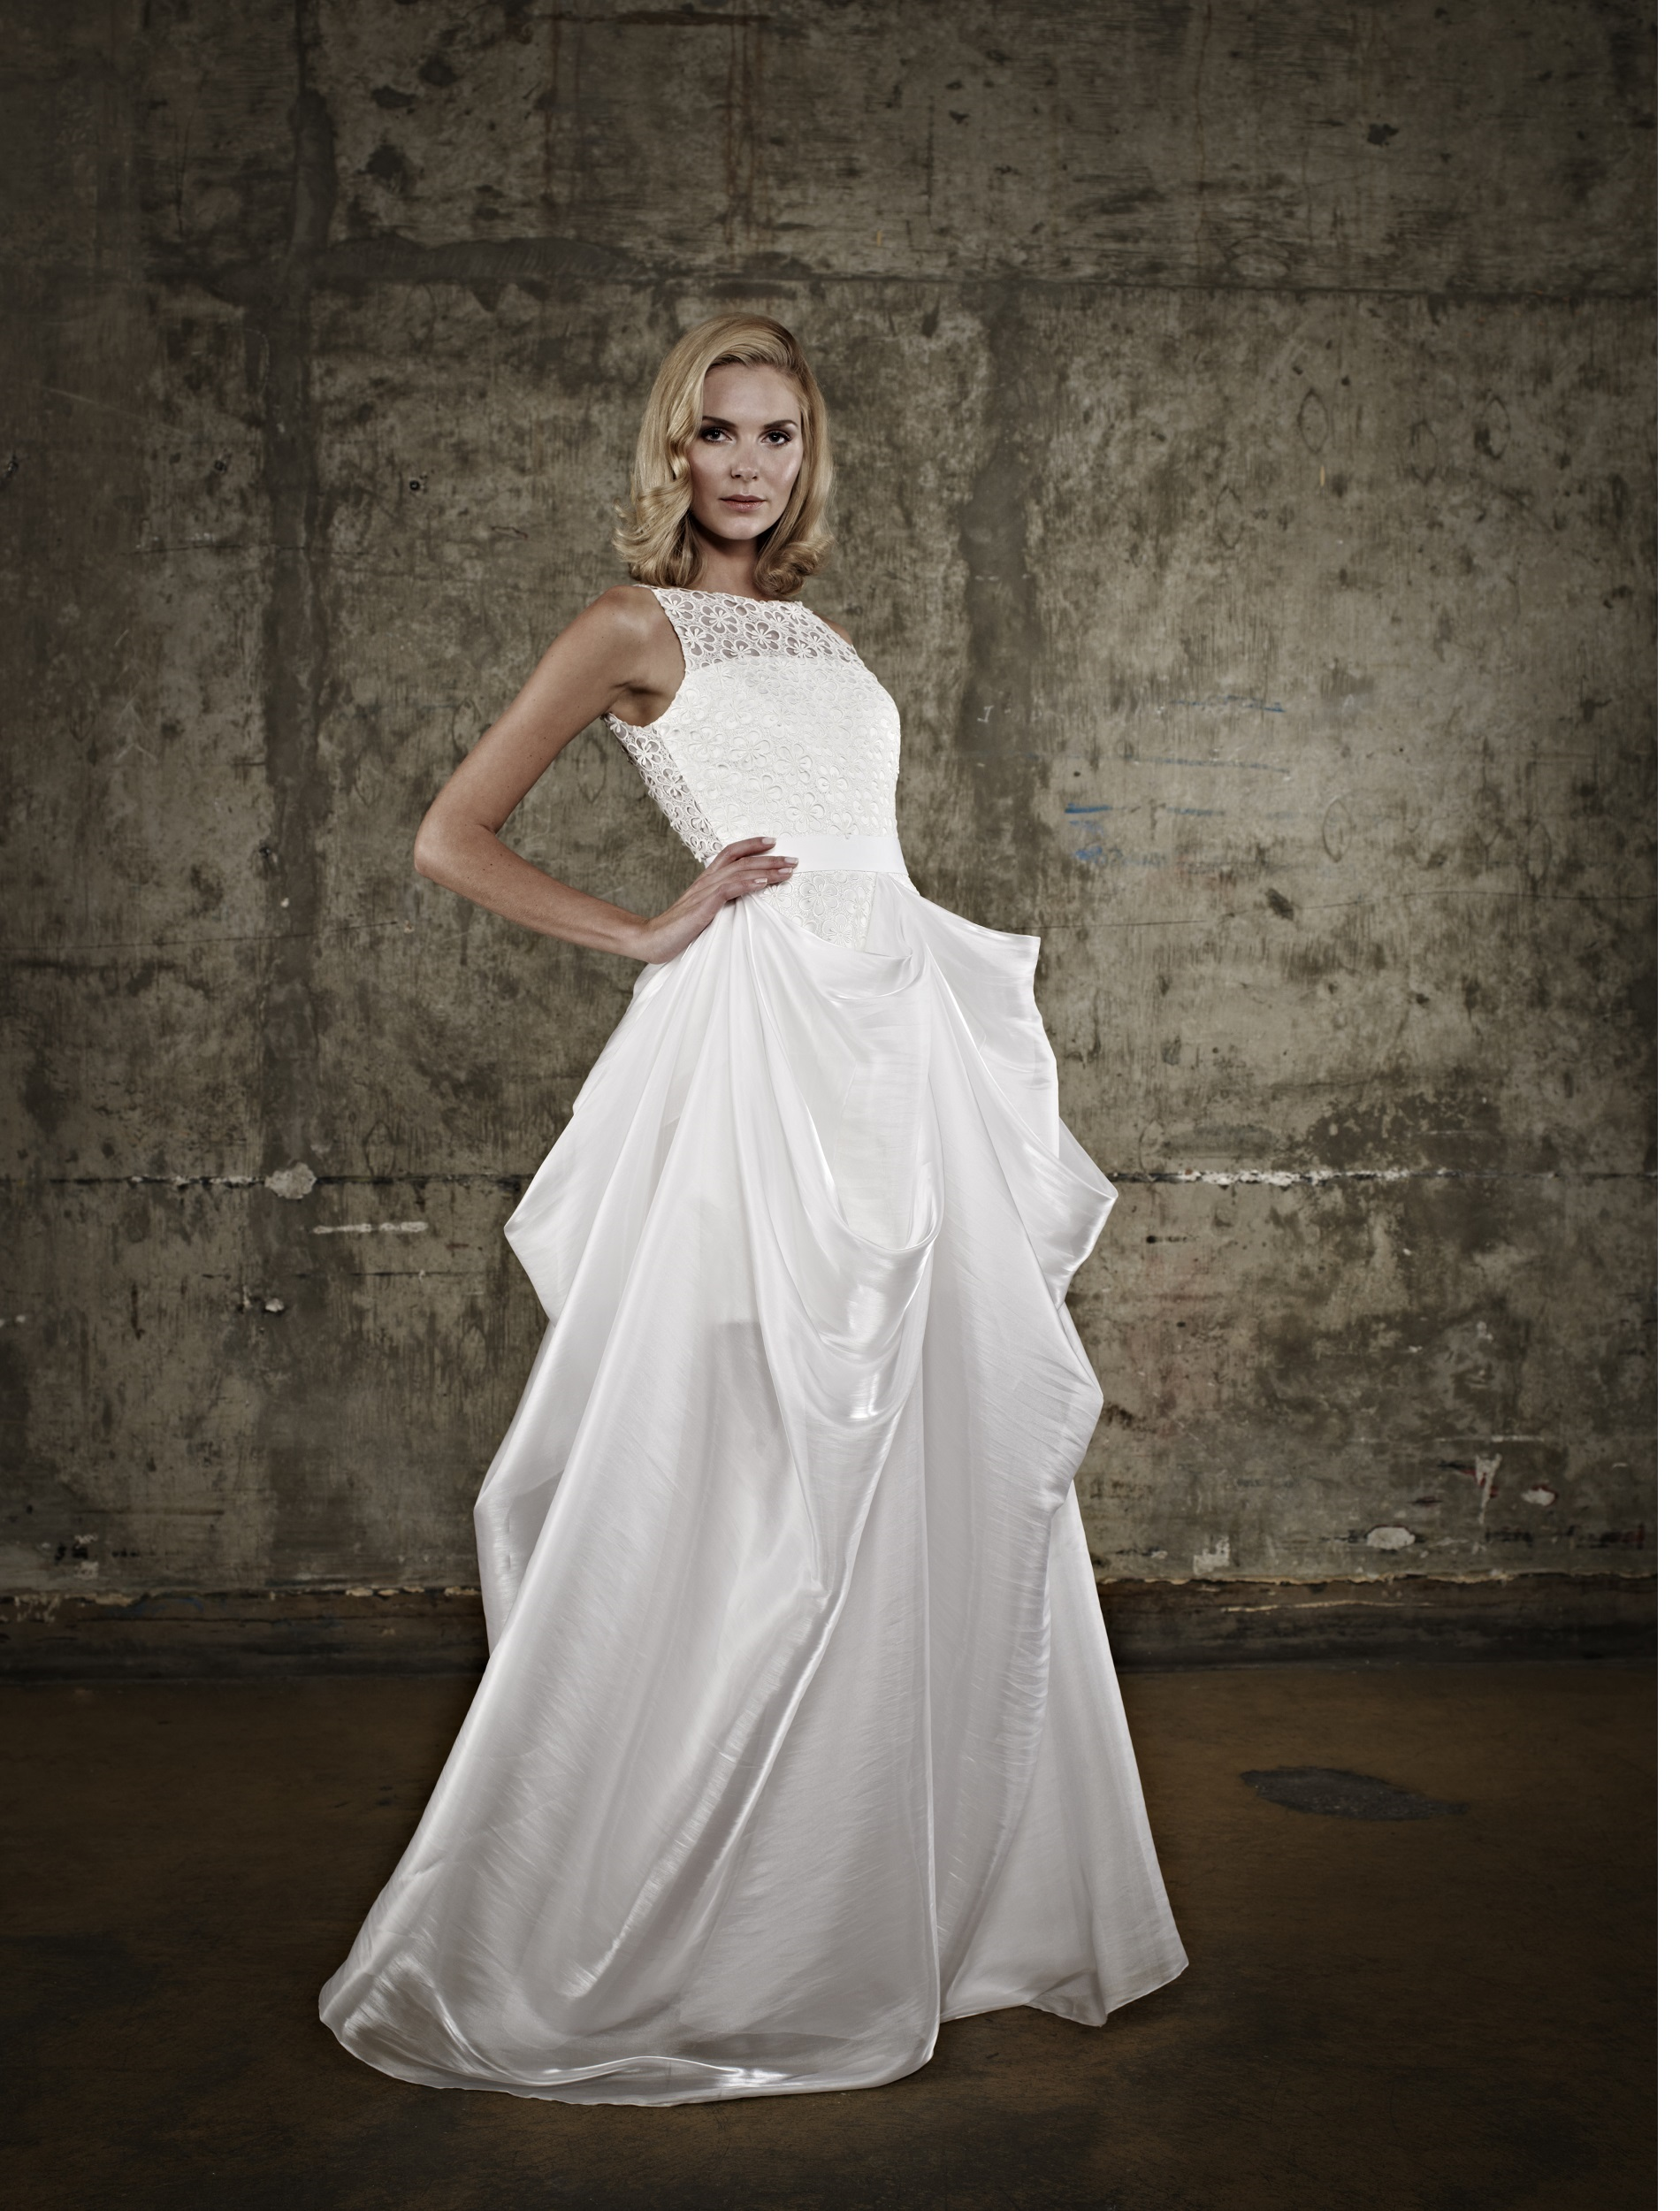 Savin London Winter Sample Sale Love My Dress Uk Wedding Blog